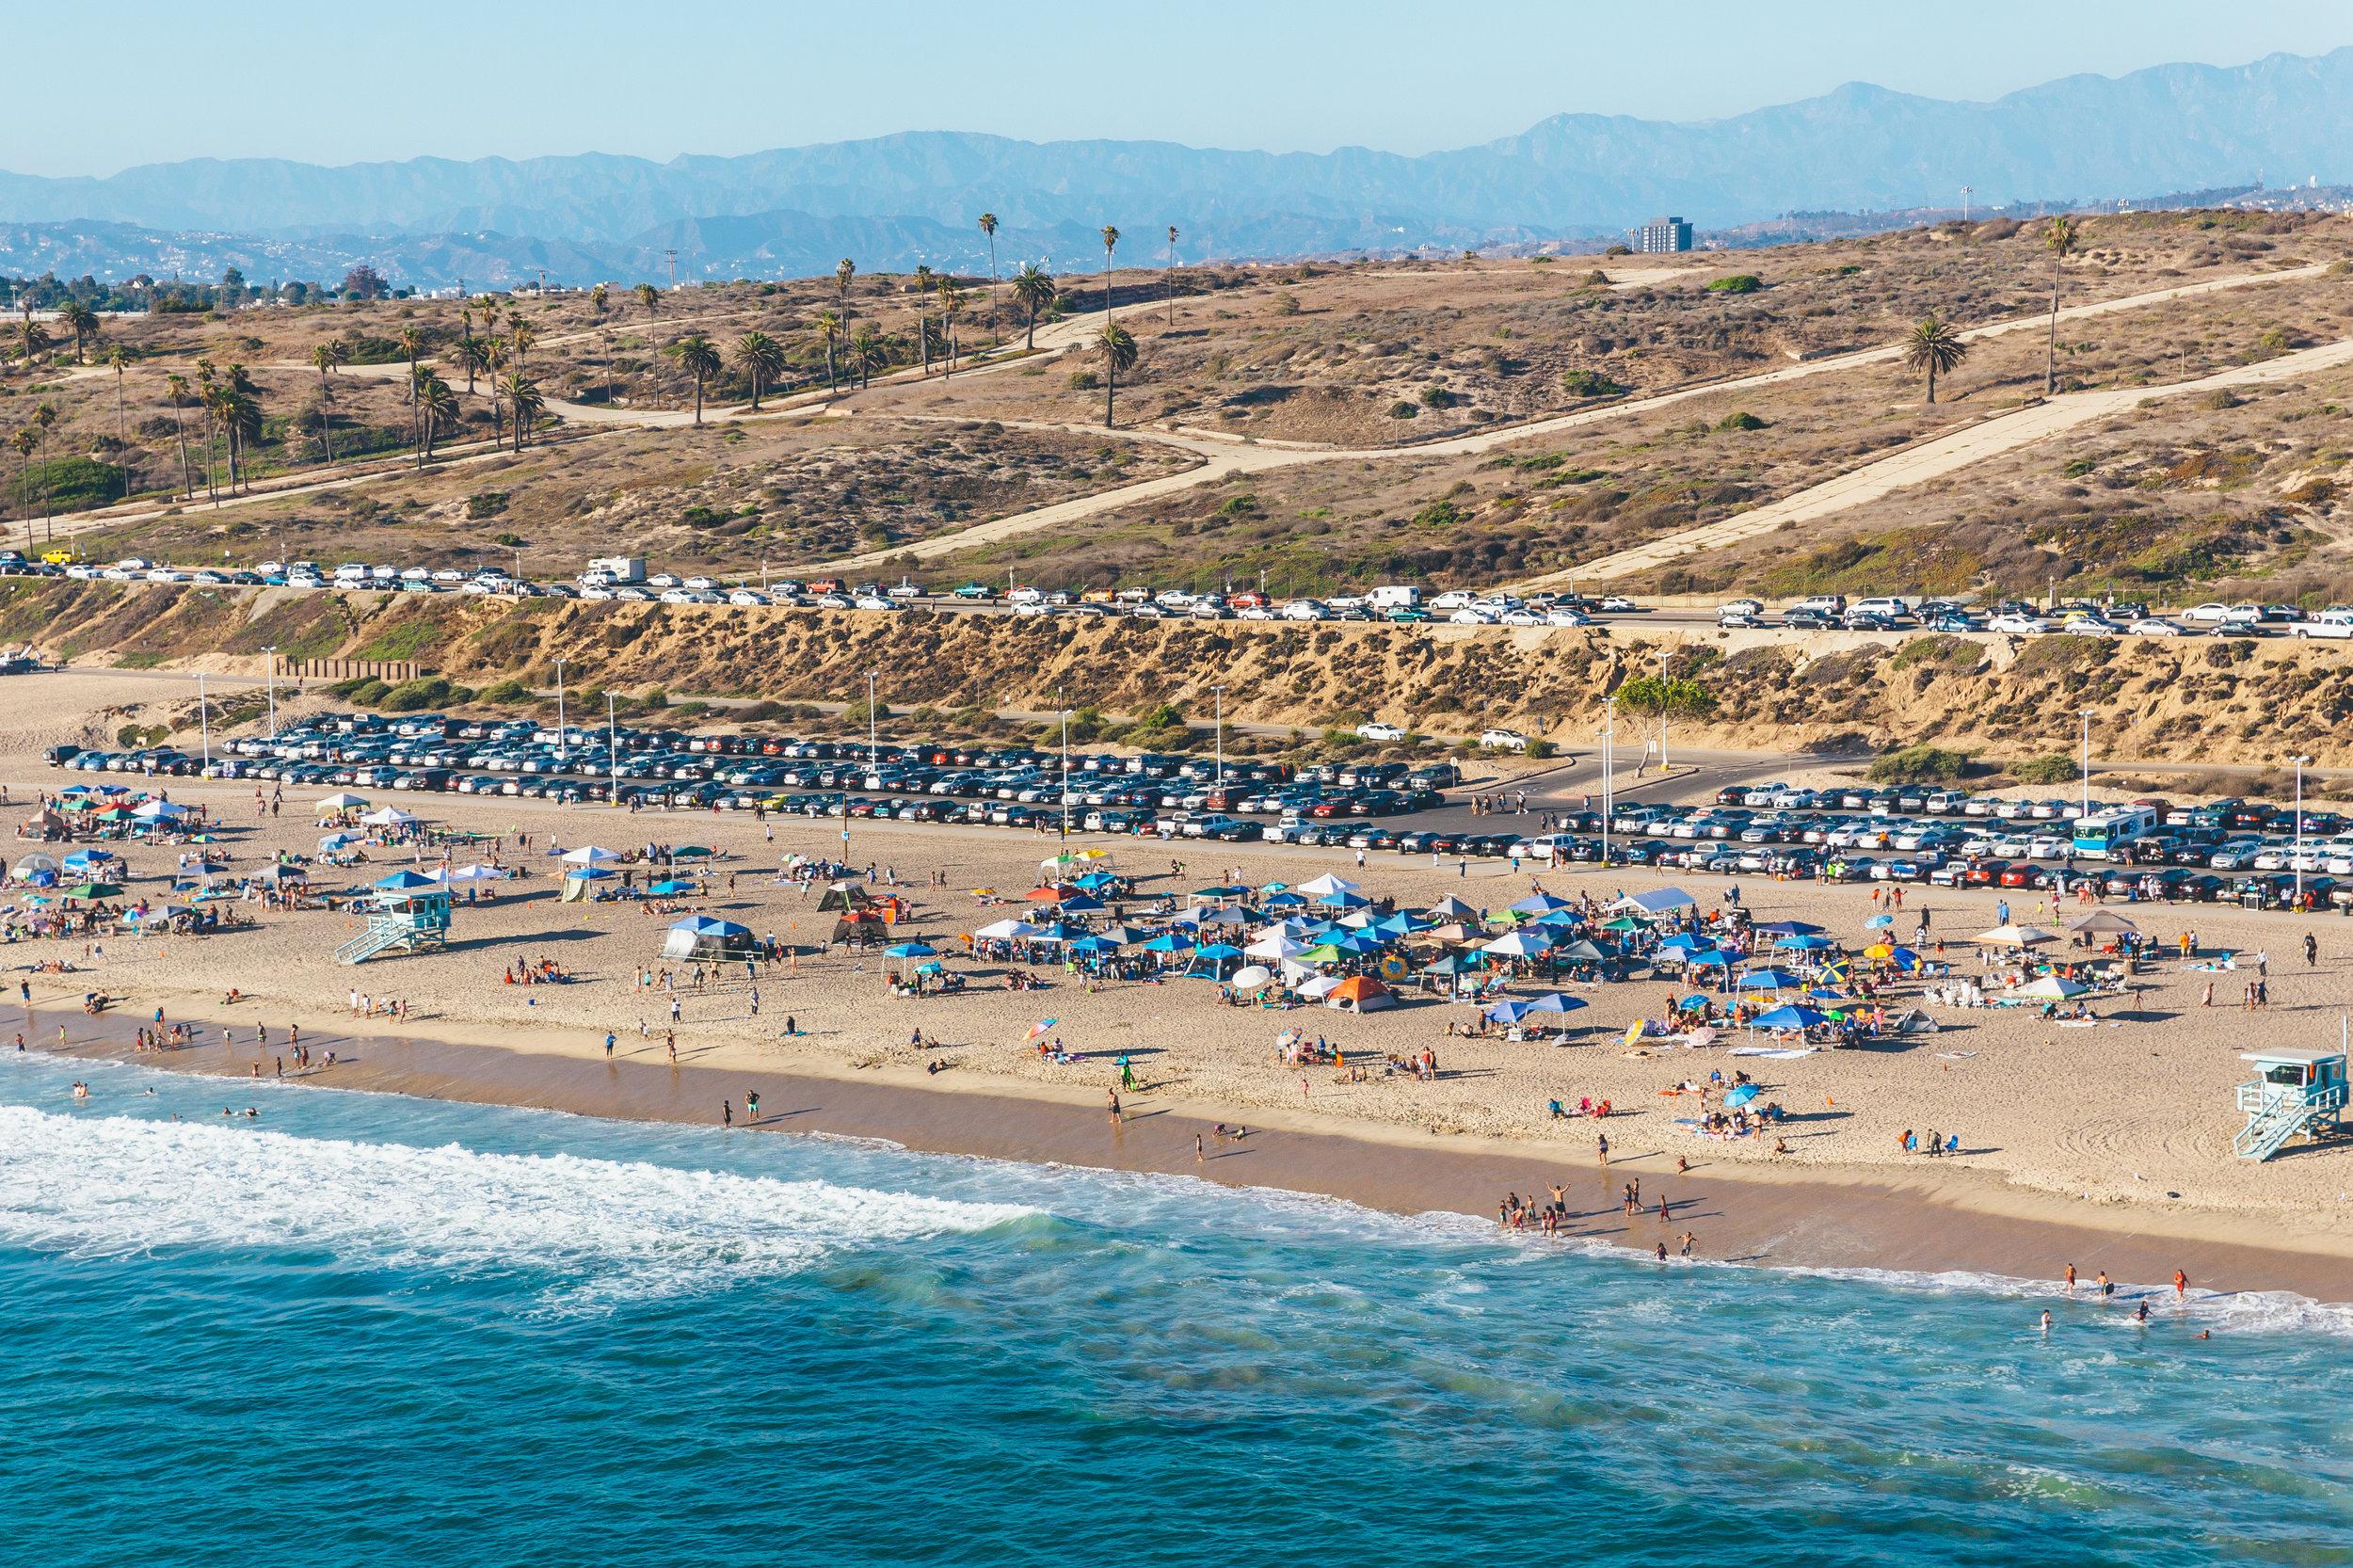 2015-LA-Aerial-007.jpg